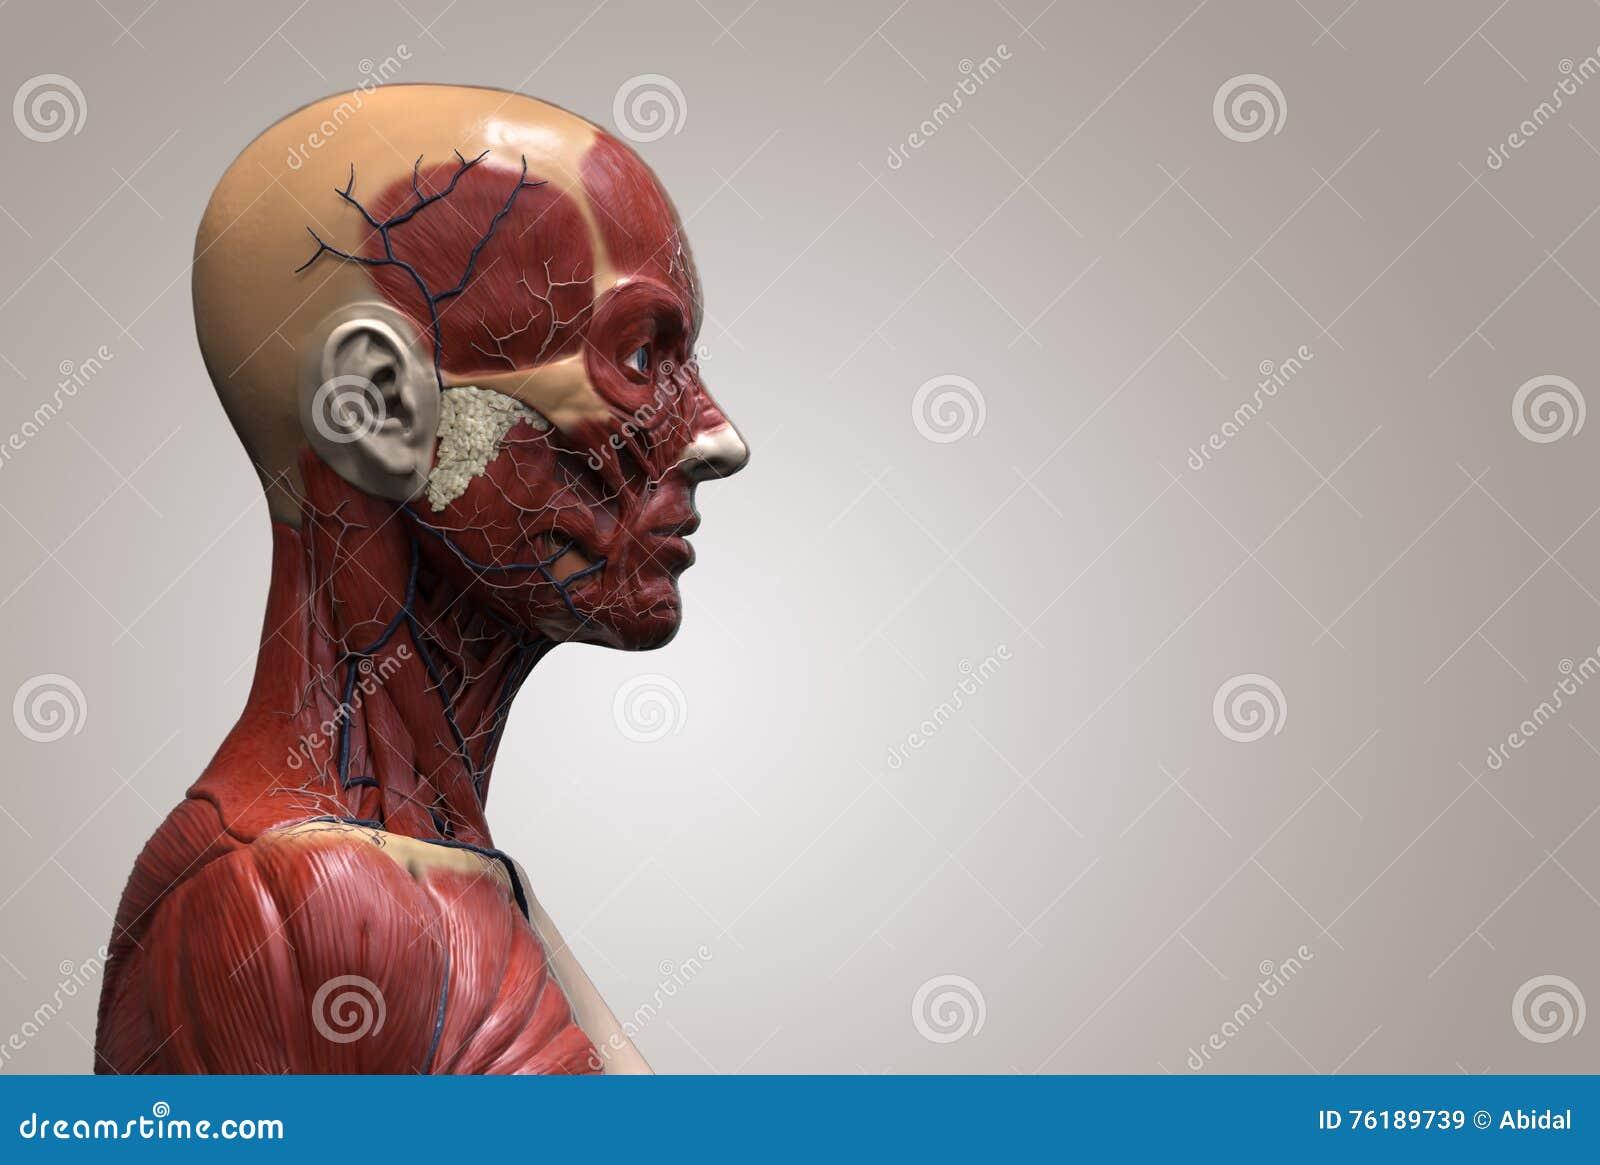 Human body anatomy stock illustration. Illustration of head - 76189739